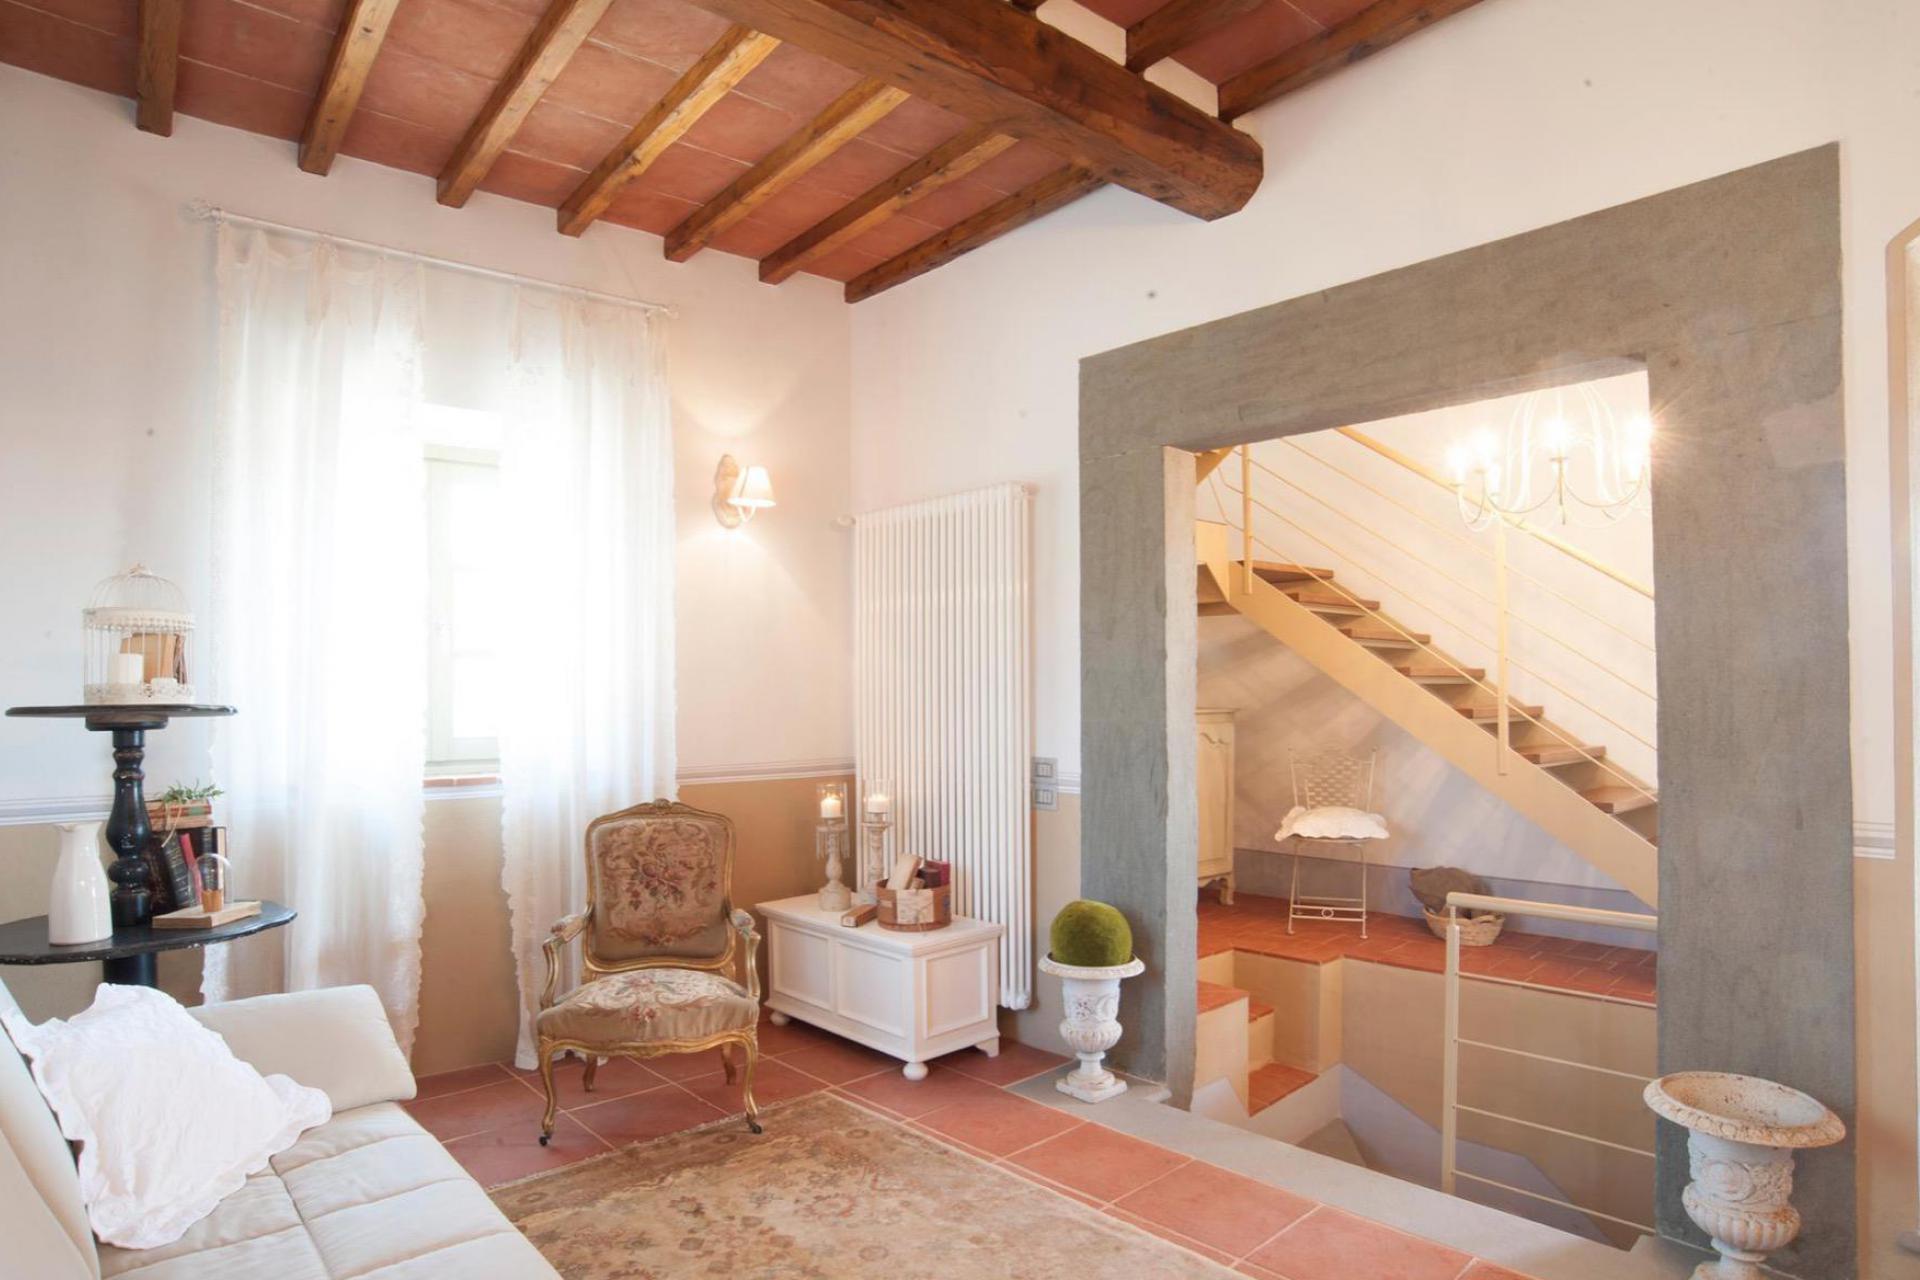 Agriturismo Toscane Agriturismo in Toscane met prachtige design inrichting